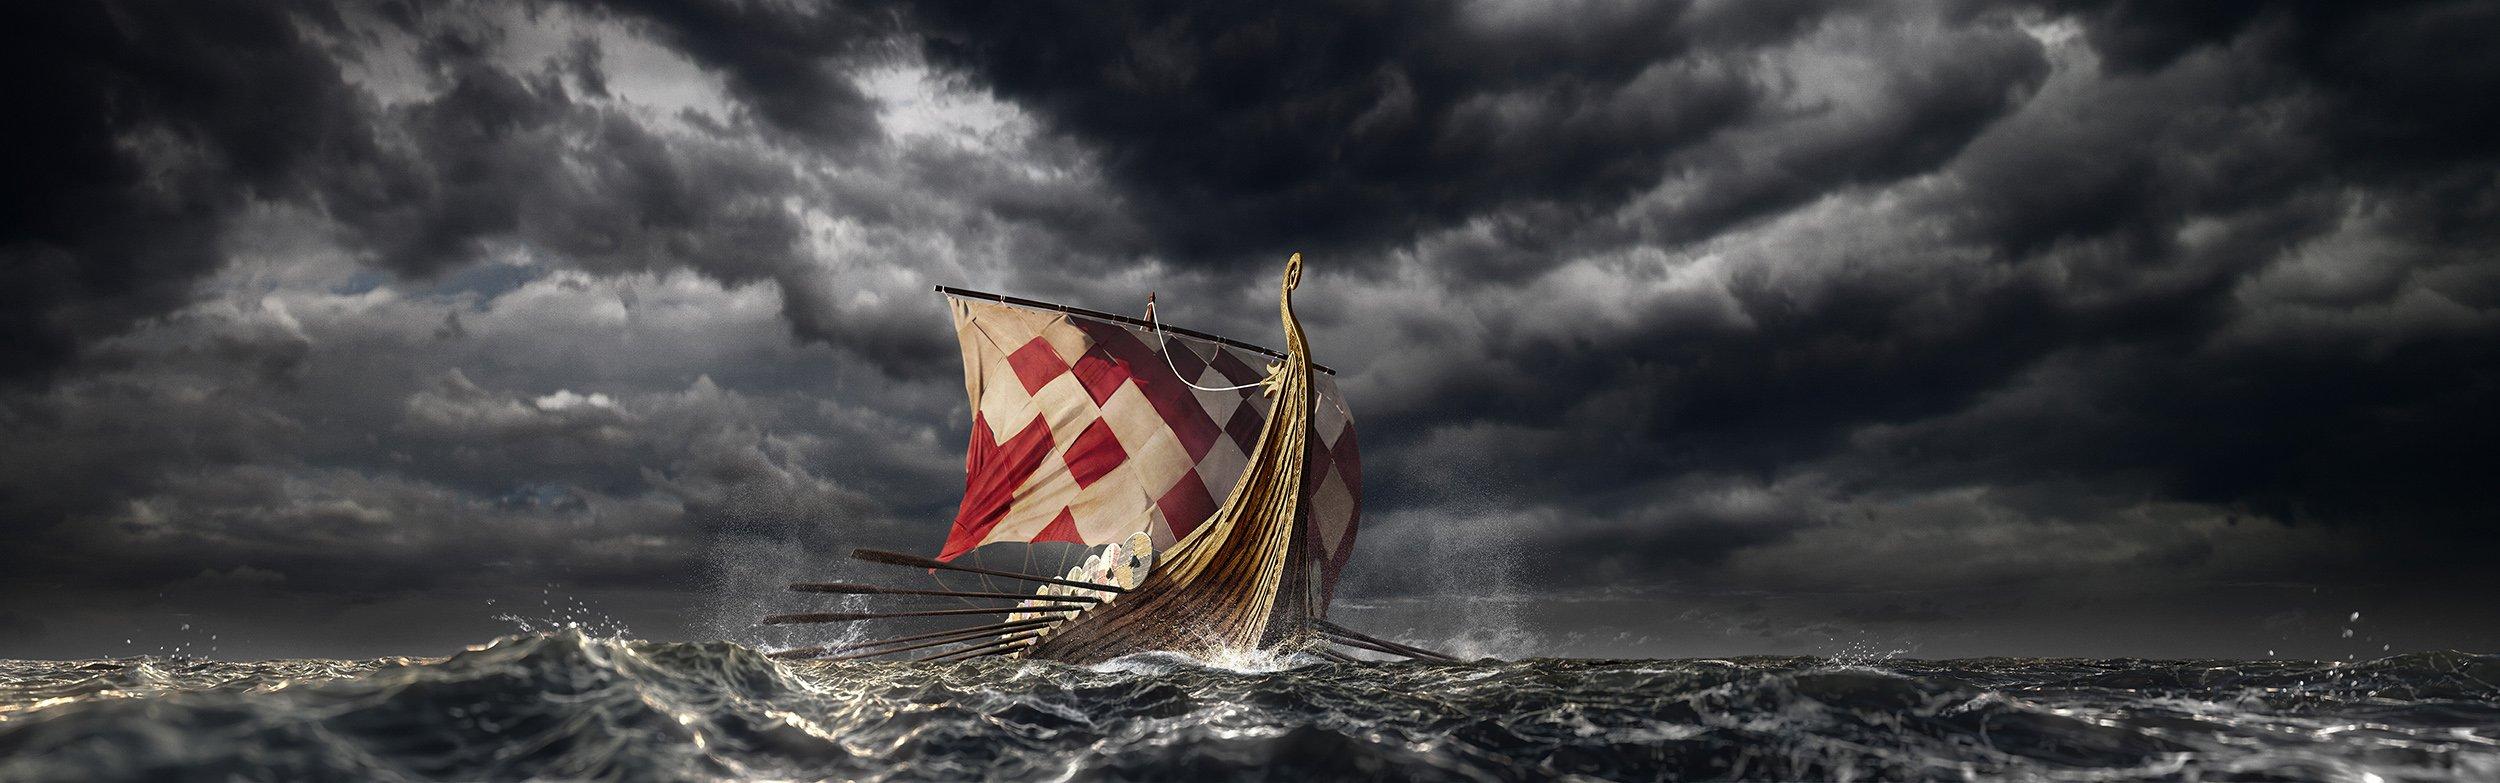 CREAM_MARITIME_MUSEUM_Viking_Ship_2013_nr_2222.jpg